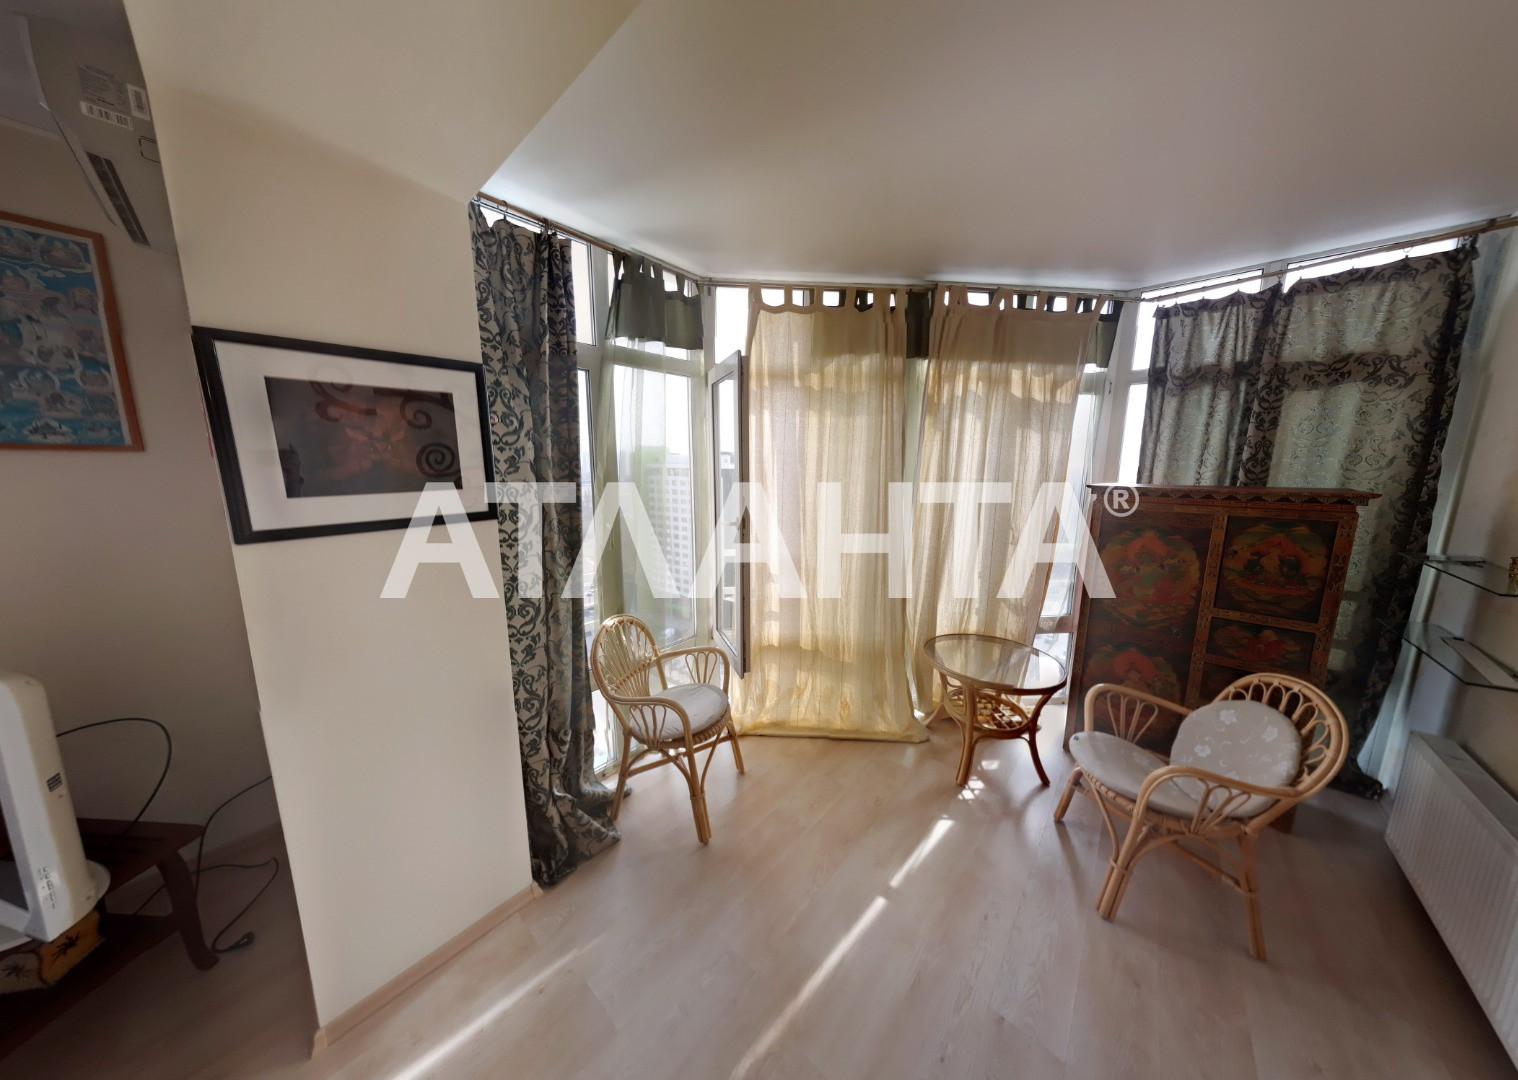 Продается 3-комнатная Квартира на ул. Ломоносова — 118 900 у.е. (фото №18)